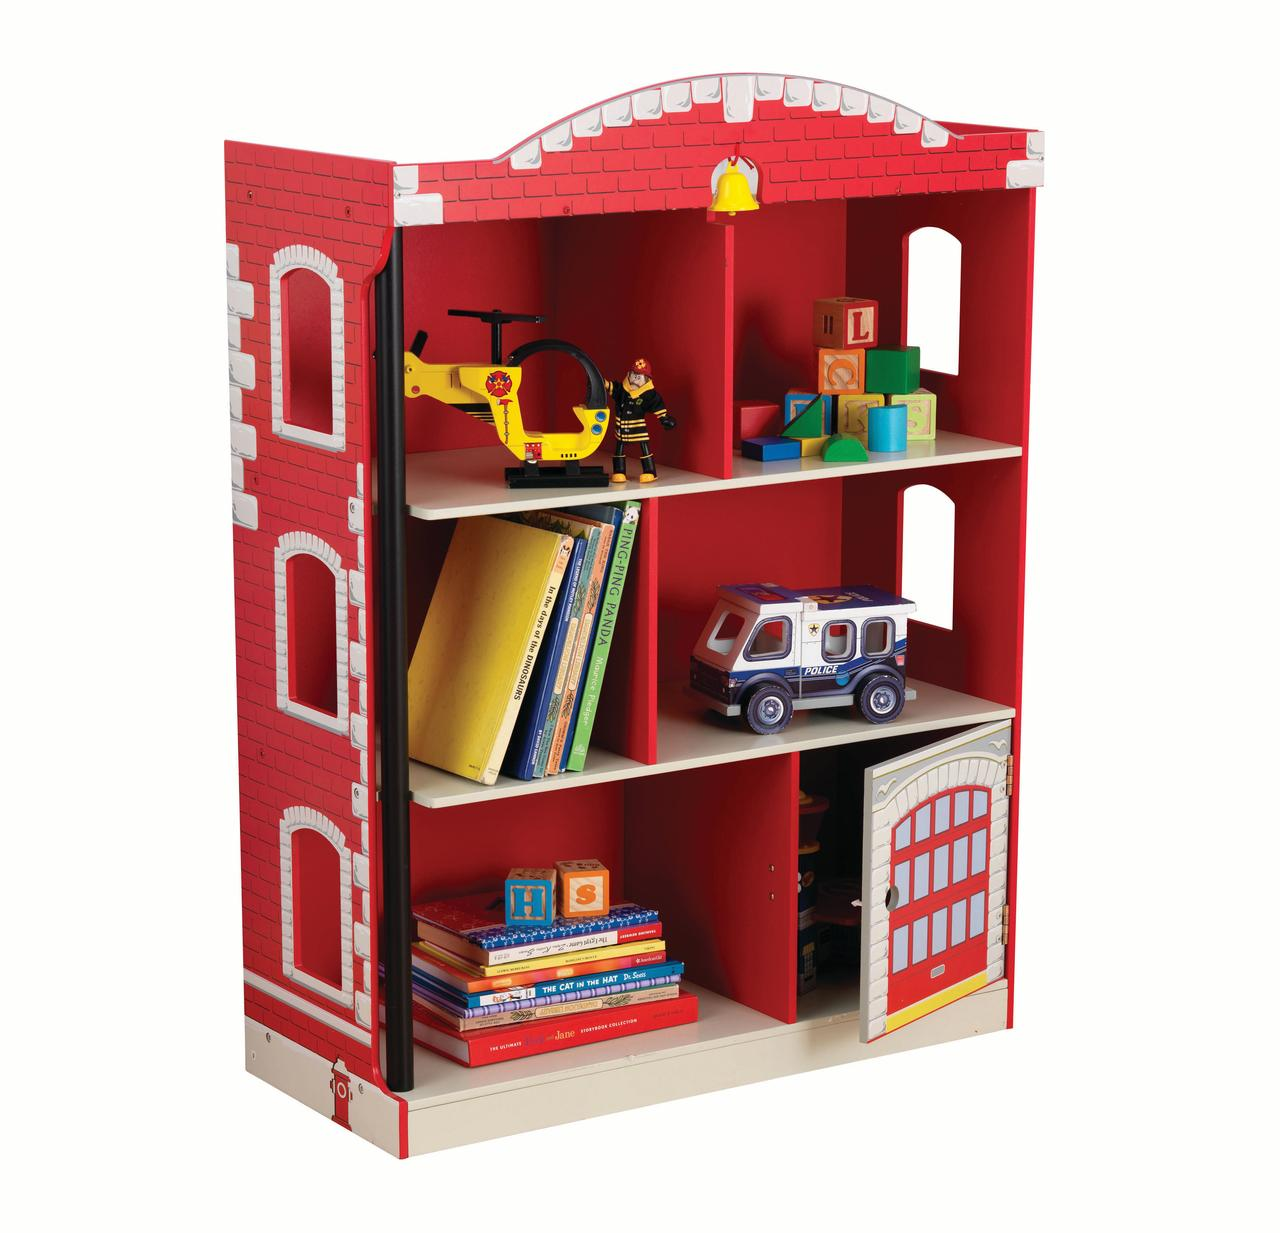 KidKraft Firehouse Kids Red Bookshelf with Garage Door Compartment